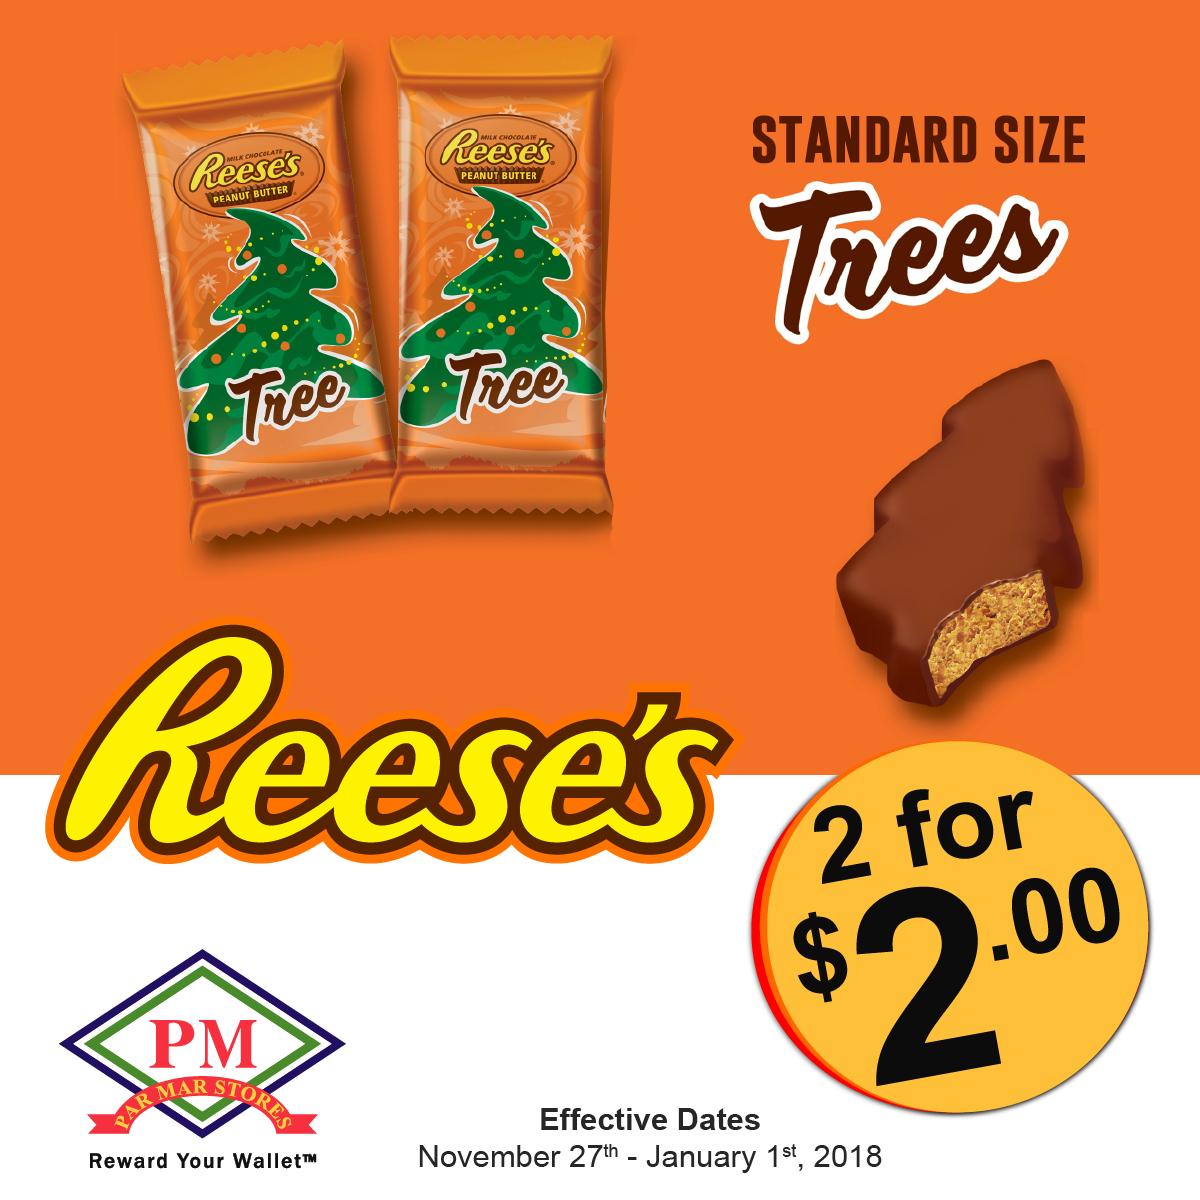 Reeses_standard